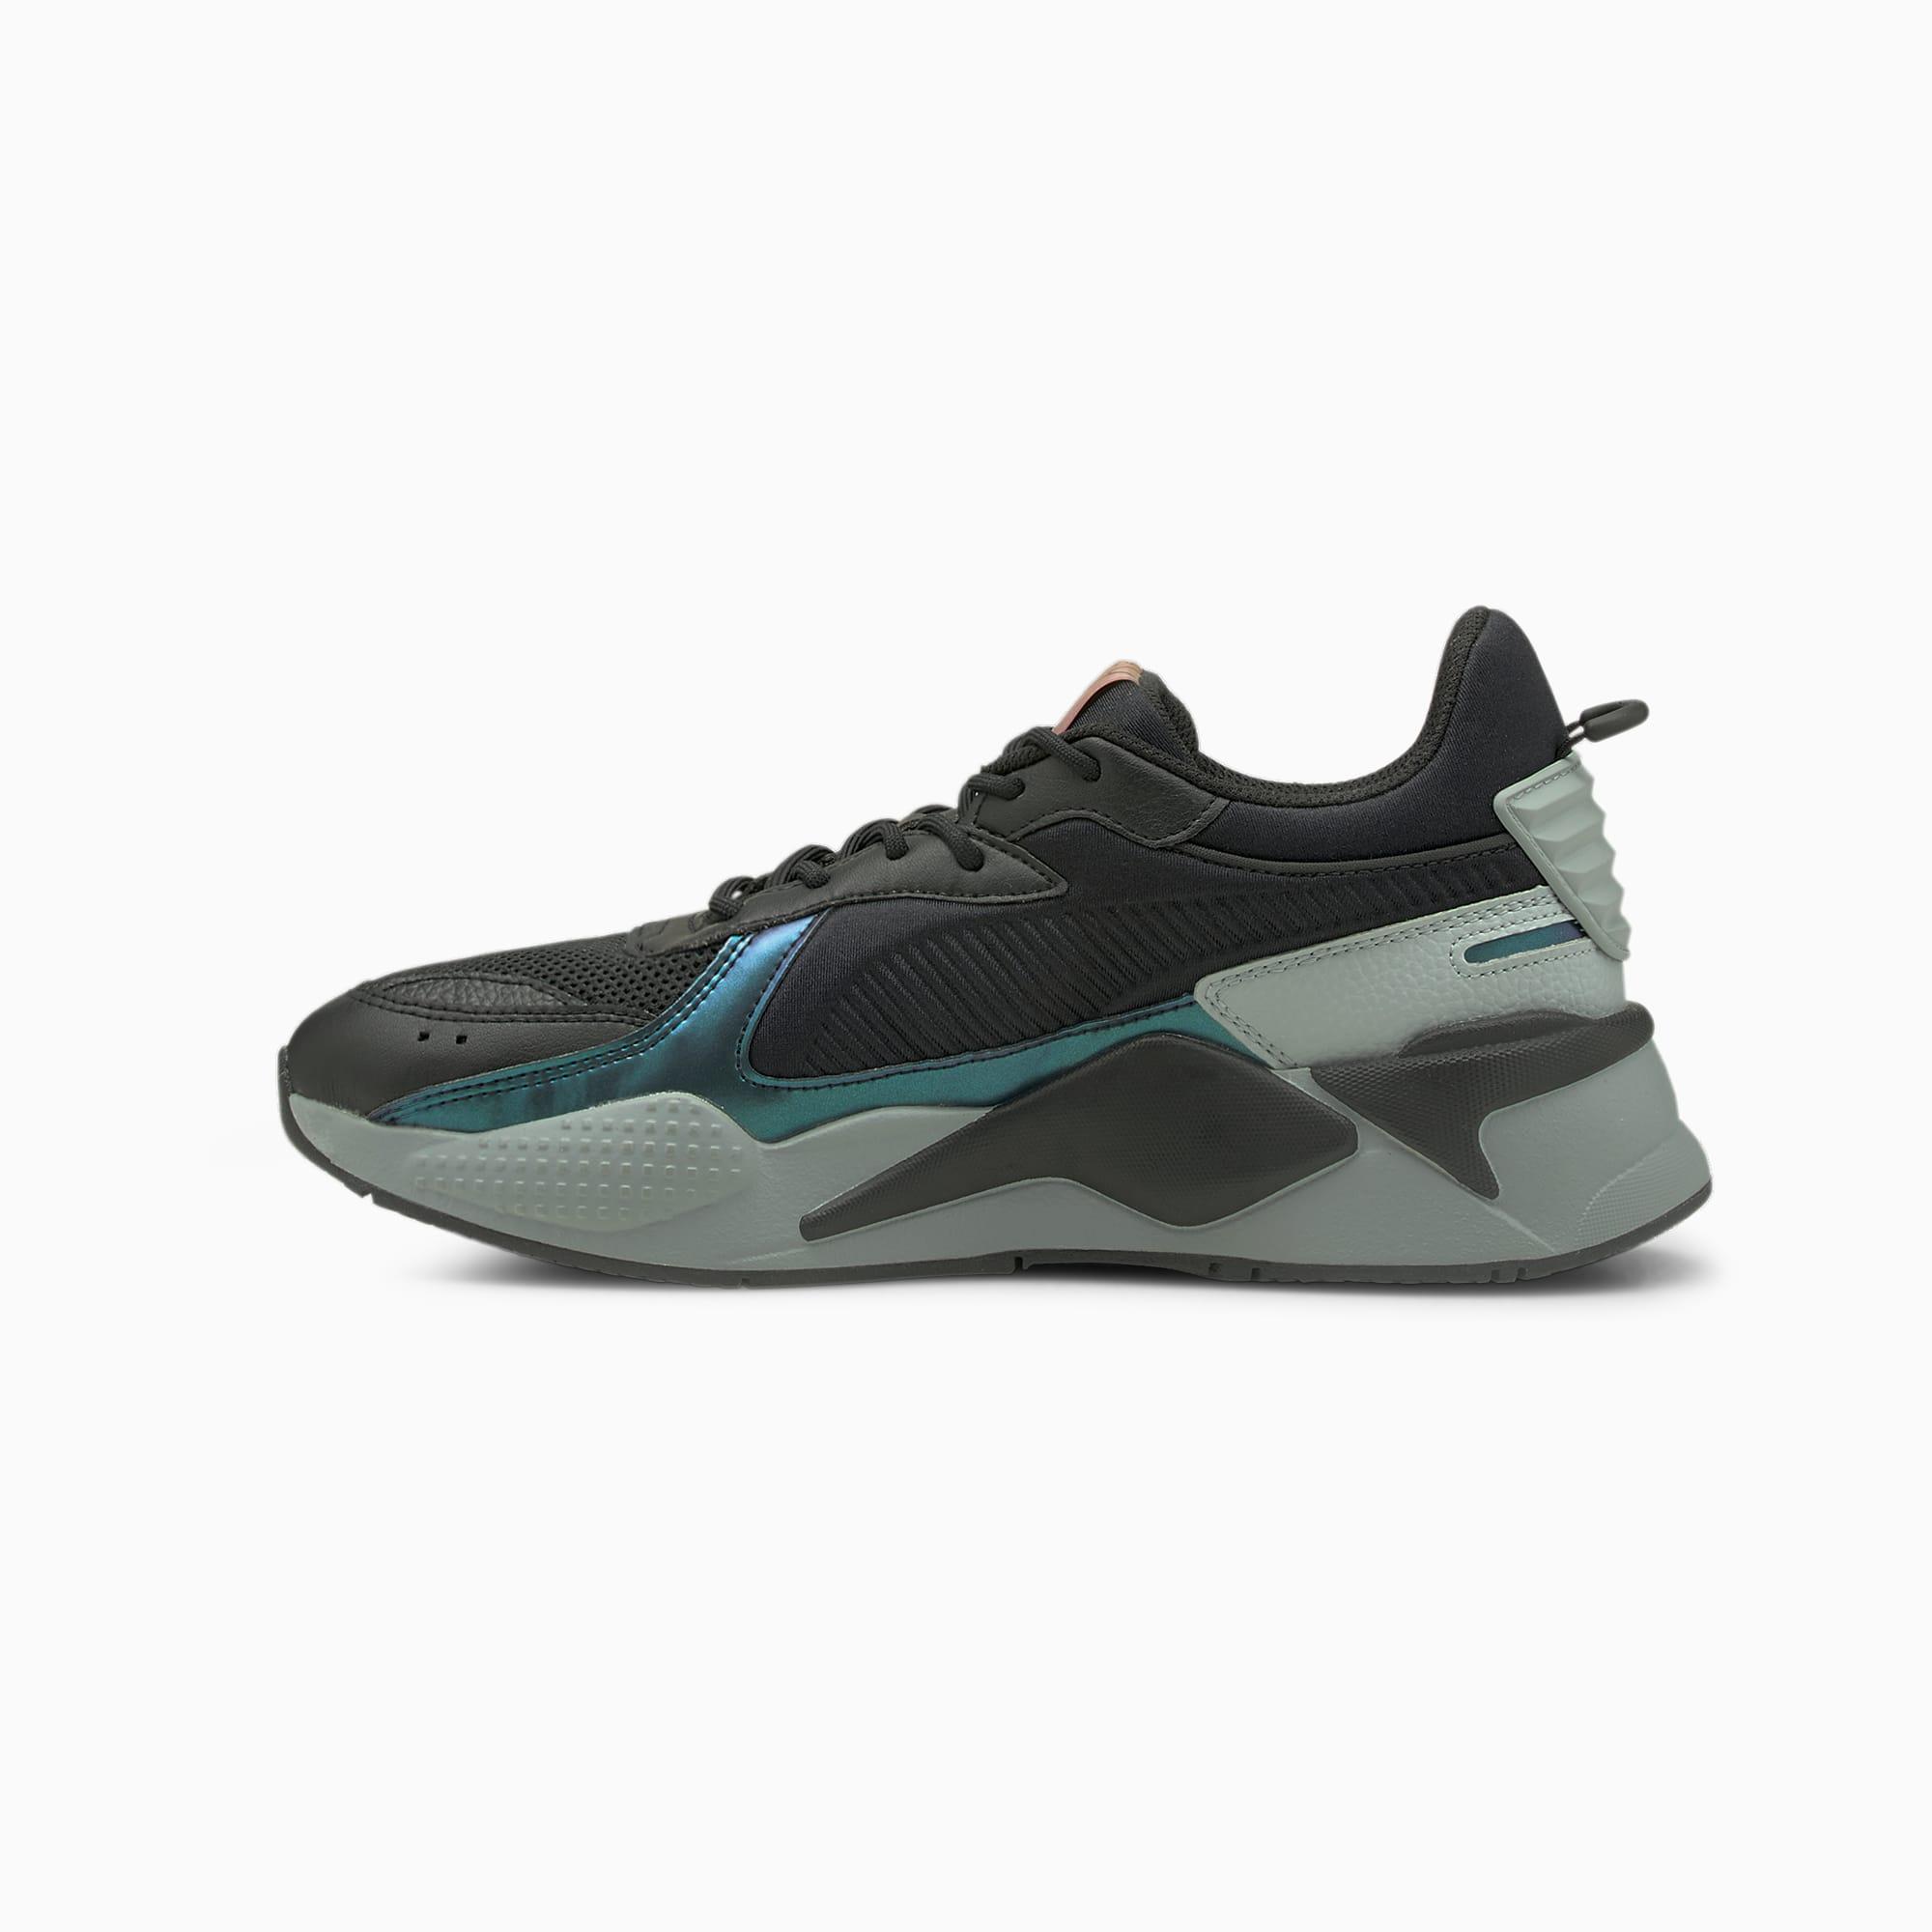 PUMA RS-X Futurverse Men's Sneakers (Black-Quarry)